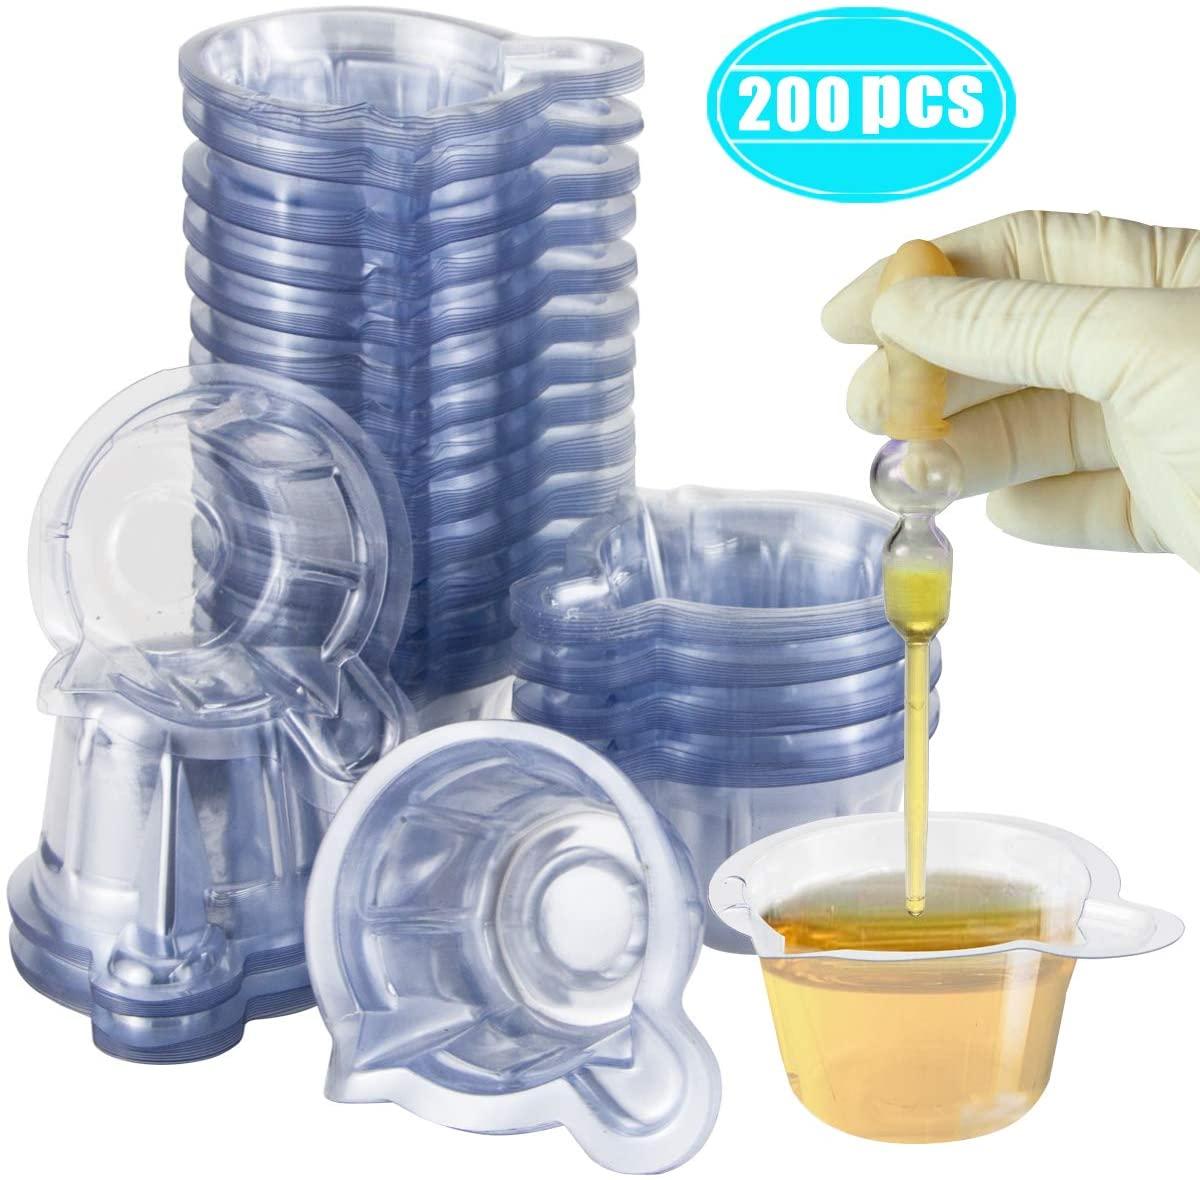 Anliswalker 200PCS Medical Disposable Plastic Urine Specimen Collection Cups Sample Cups for Pregnancy Test,Ovulation Test,PH Test,60ML